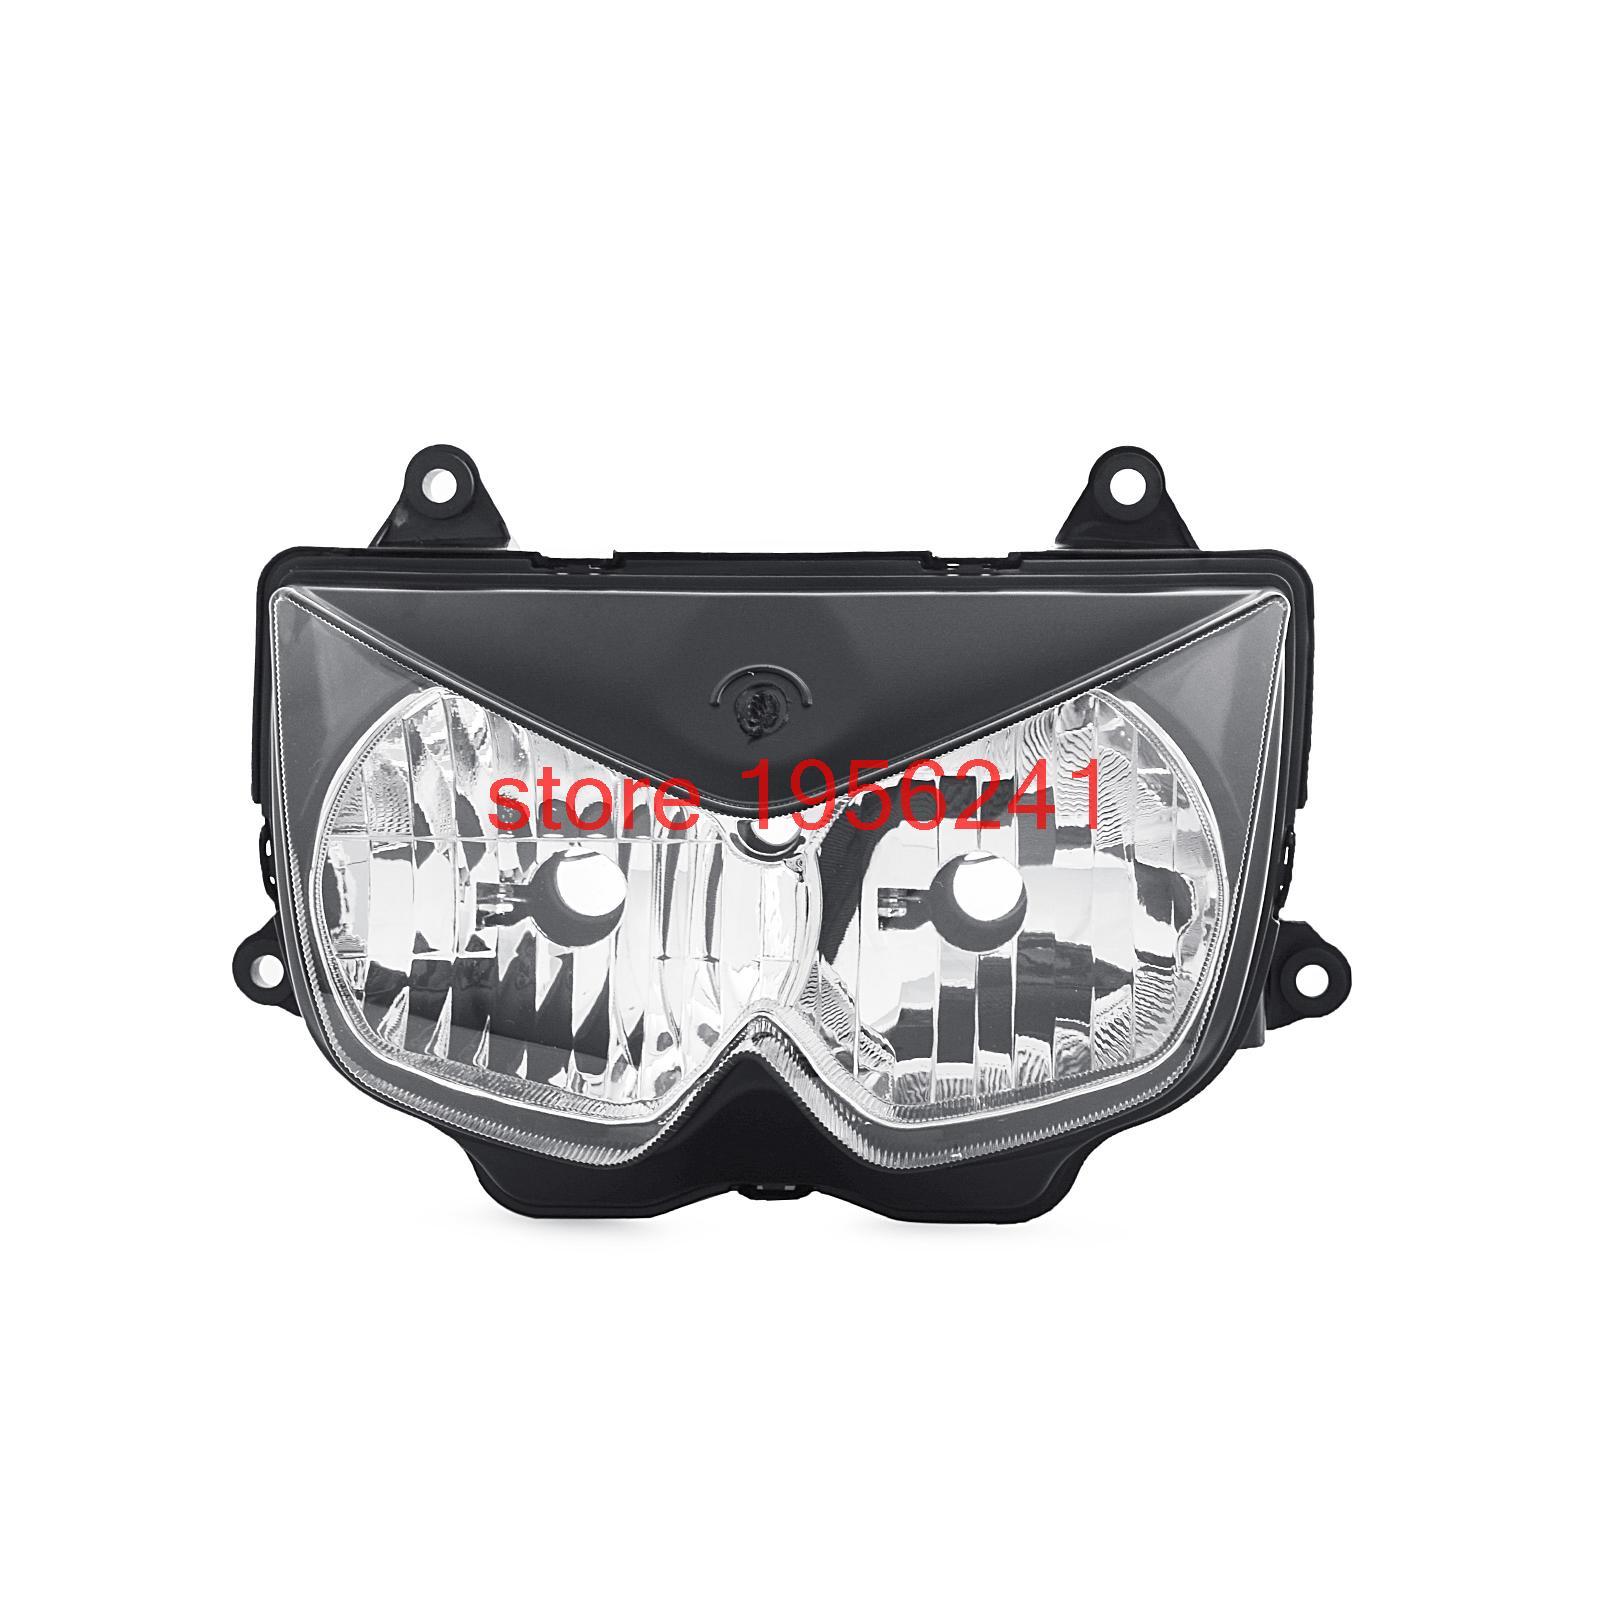 Motorcycle  Replacement Head Light Headlamp Assembly For Kawasaki Ninja 250R EX250 2008 09 10 11 2012 Replace OEM 23007-0121